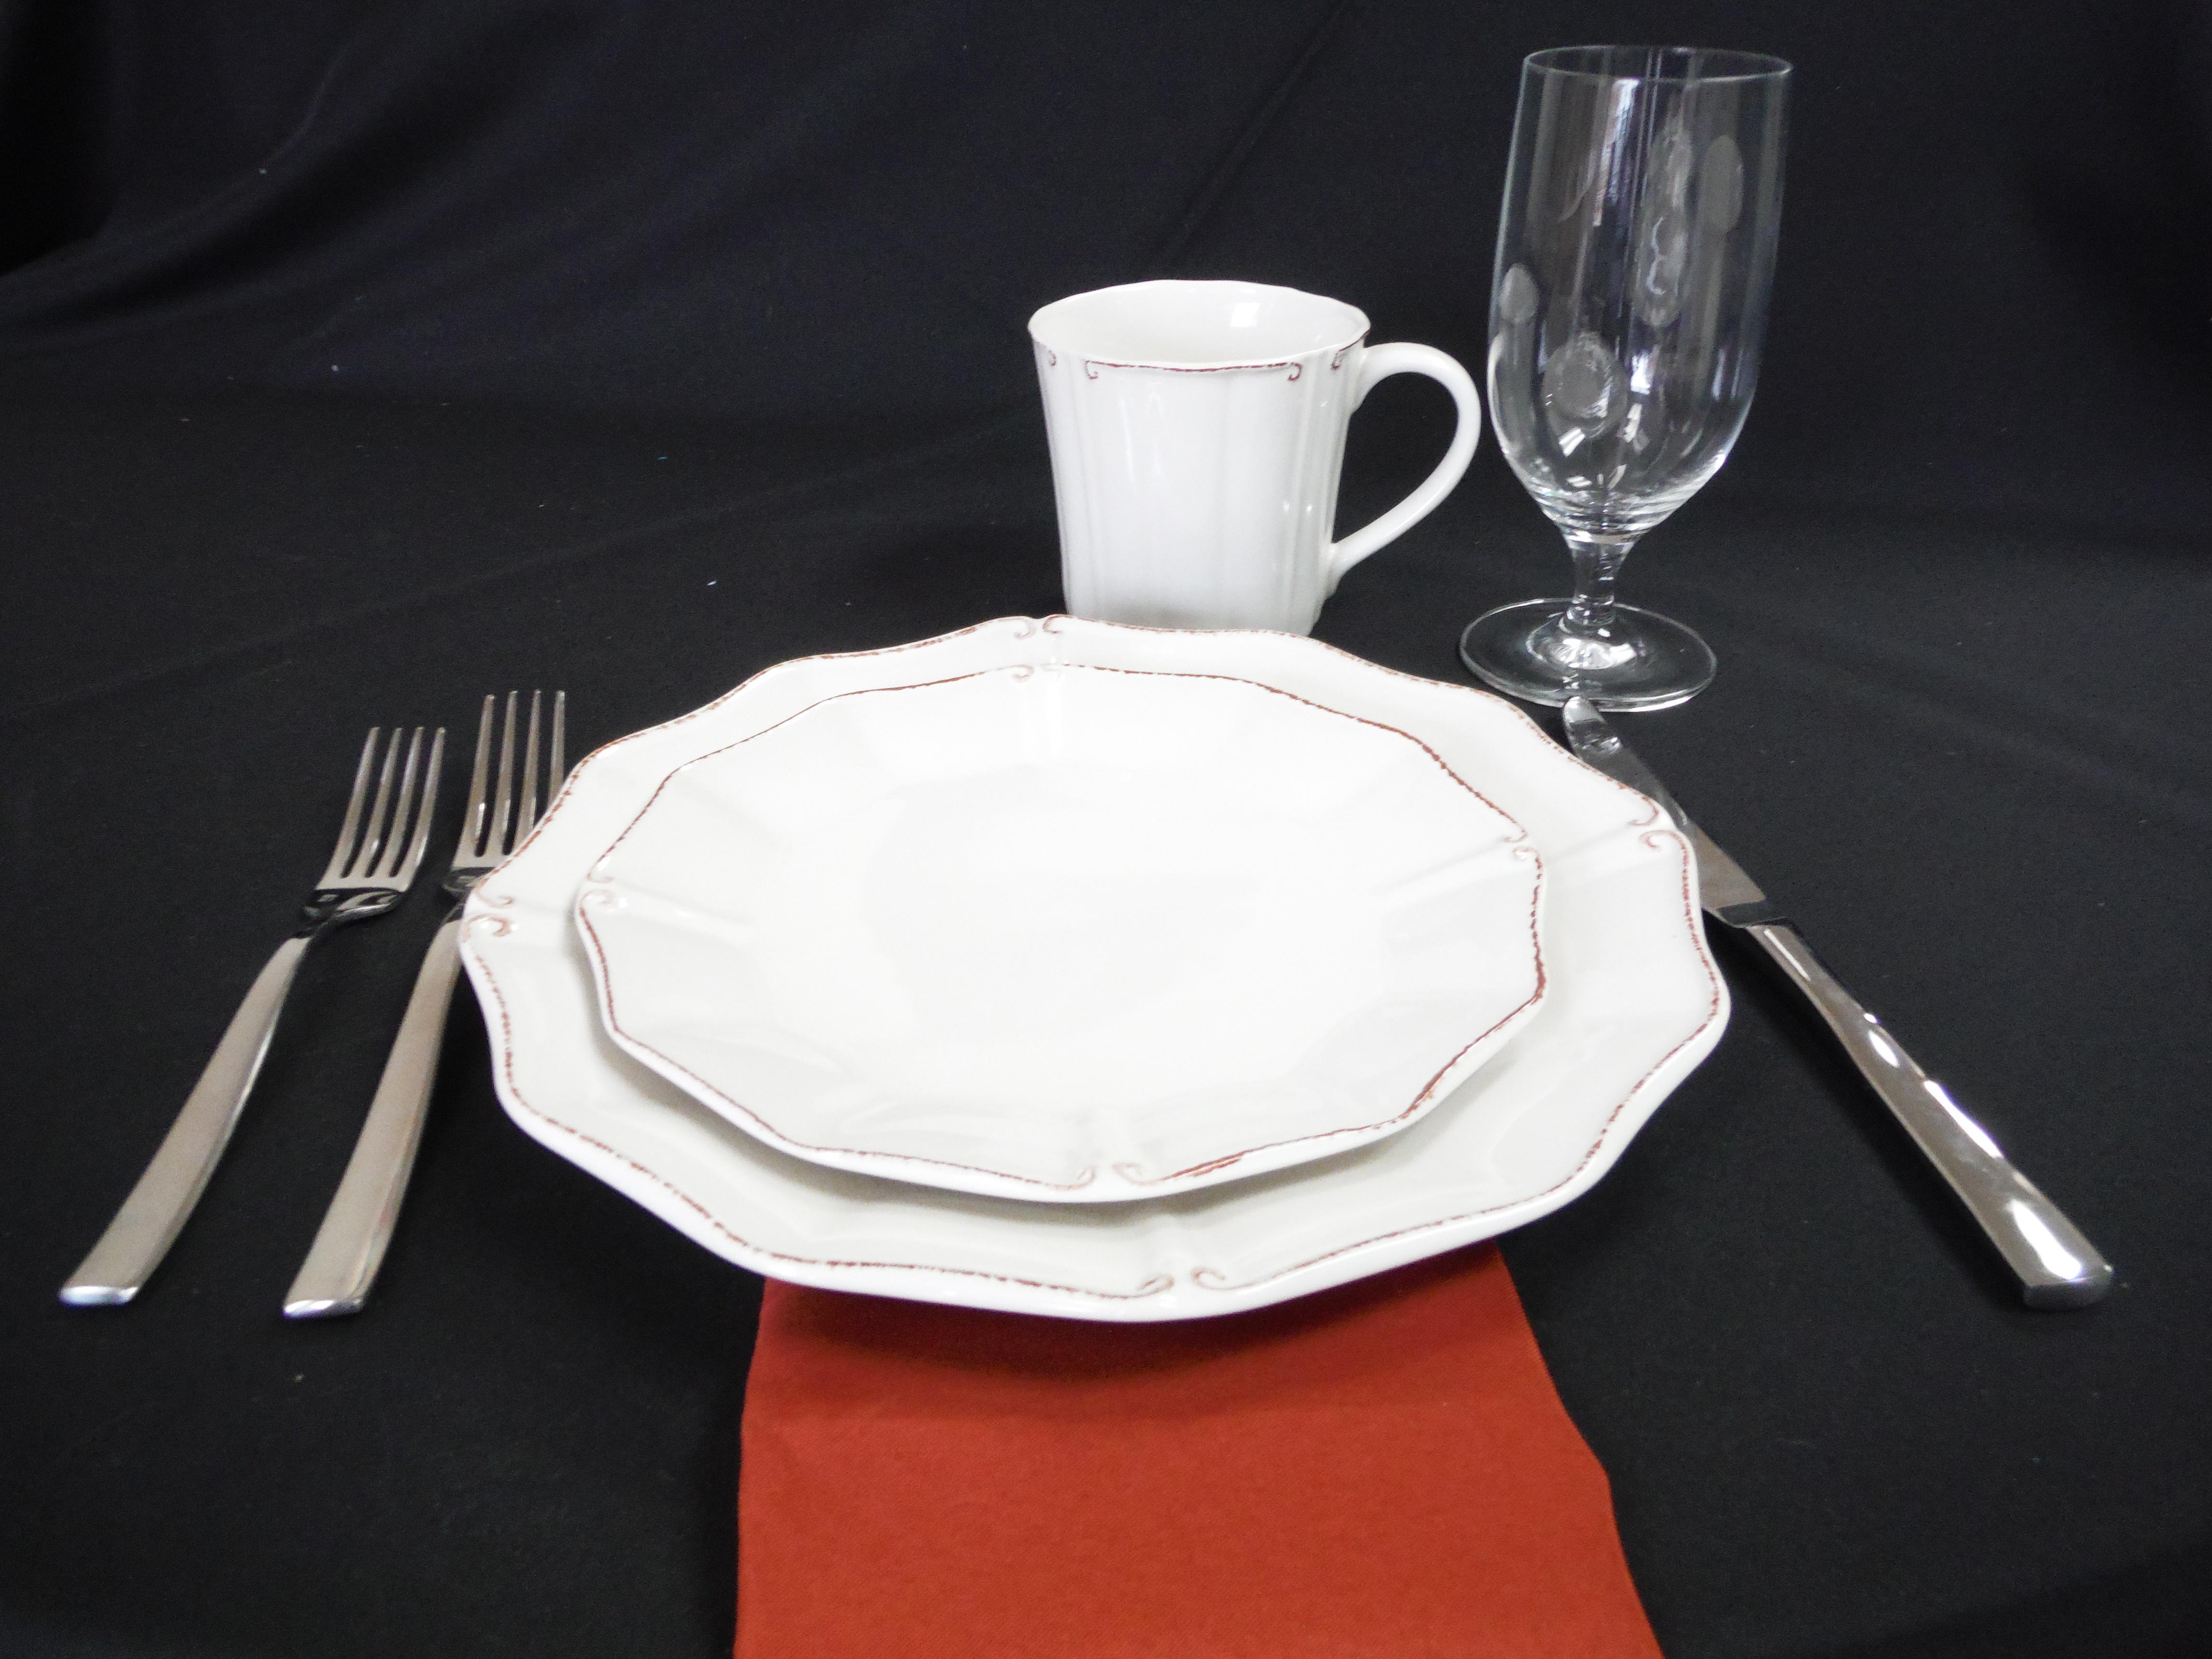 Villa Salad/Dessert Plate 3063